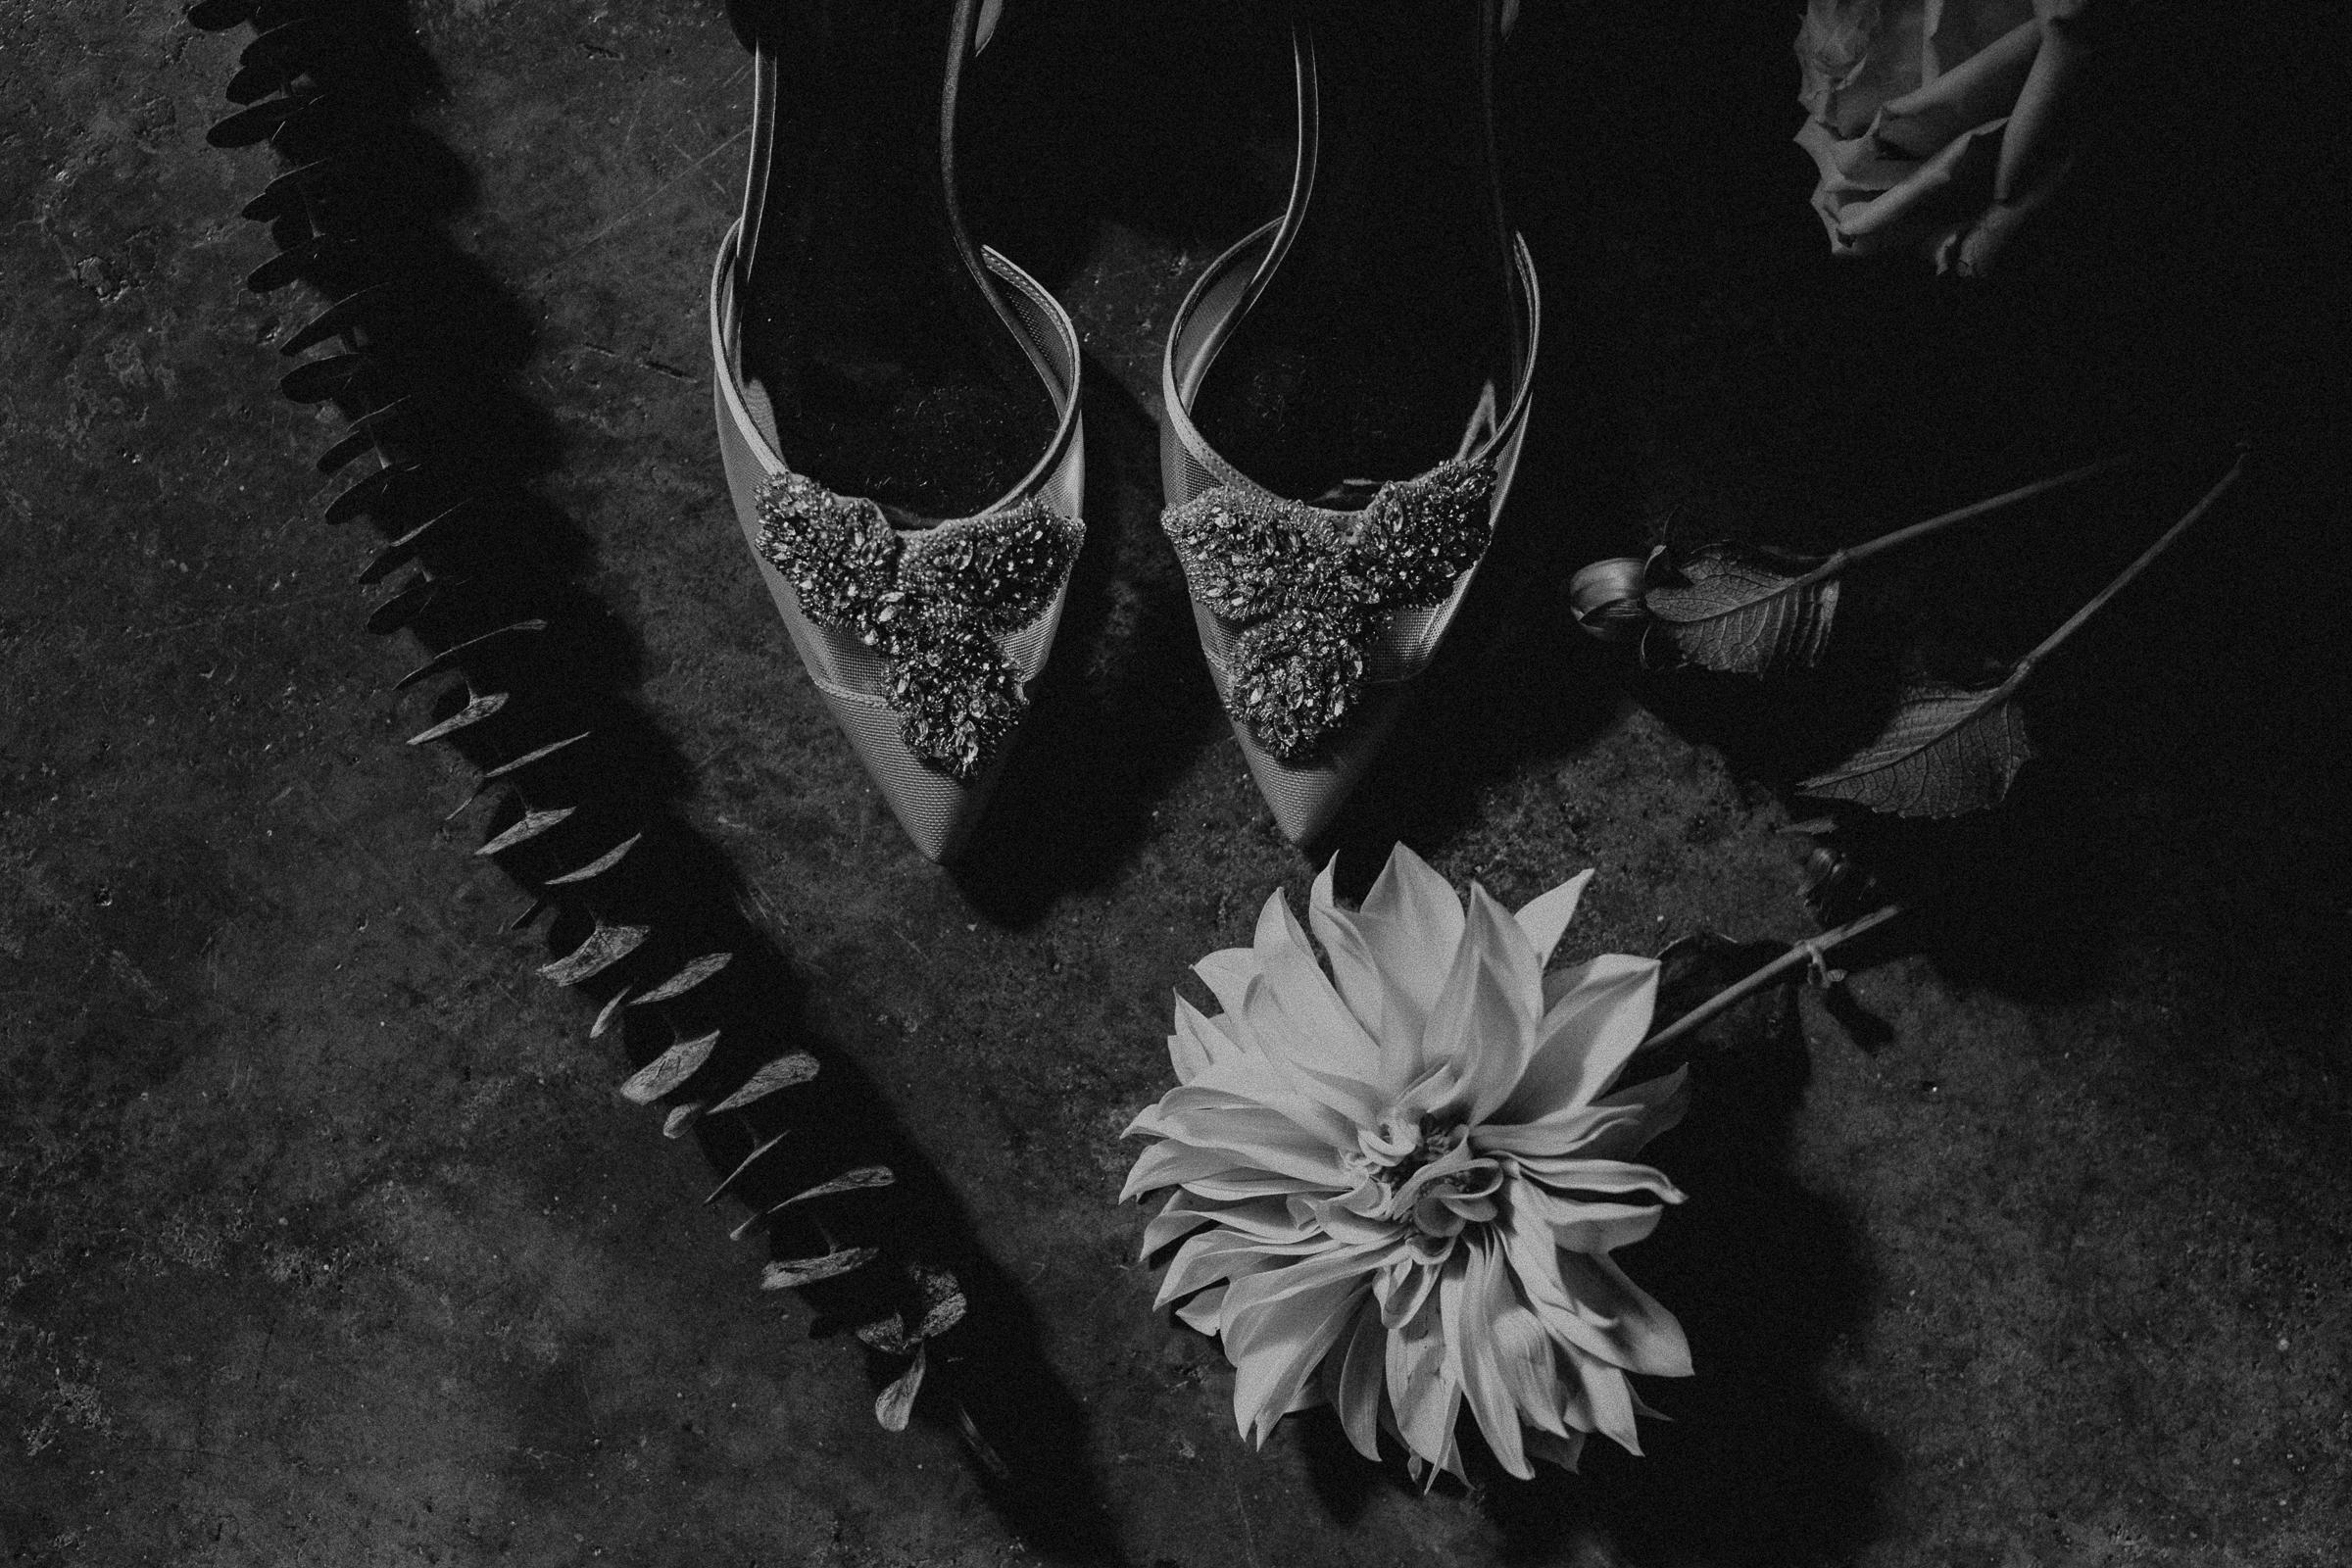 Gretchen Gause Photography | Los Angeles Hudson Loft Wedding #hudsonloft #laweddingphotographer #DTLA #weddingplanning #romanticwedding #weddingdetails #caweddingphotographer #weddingphotography